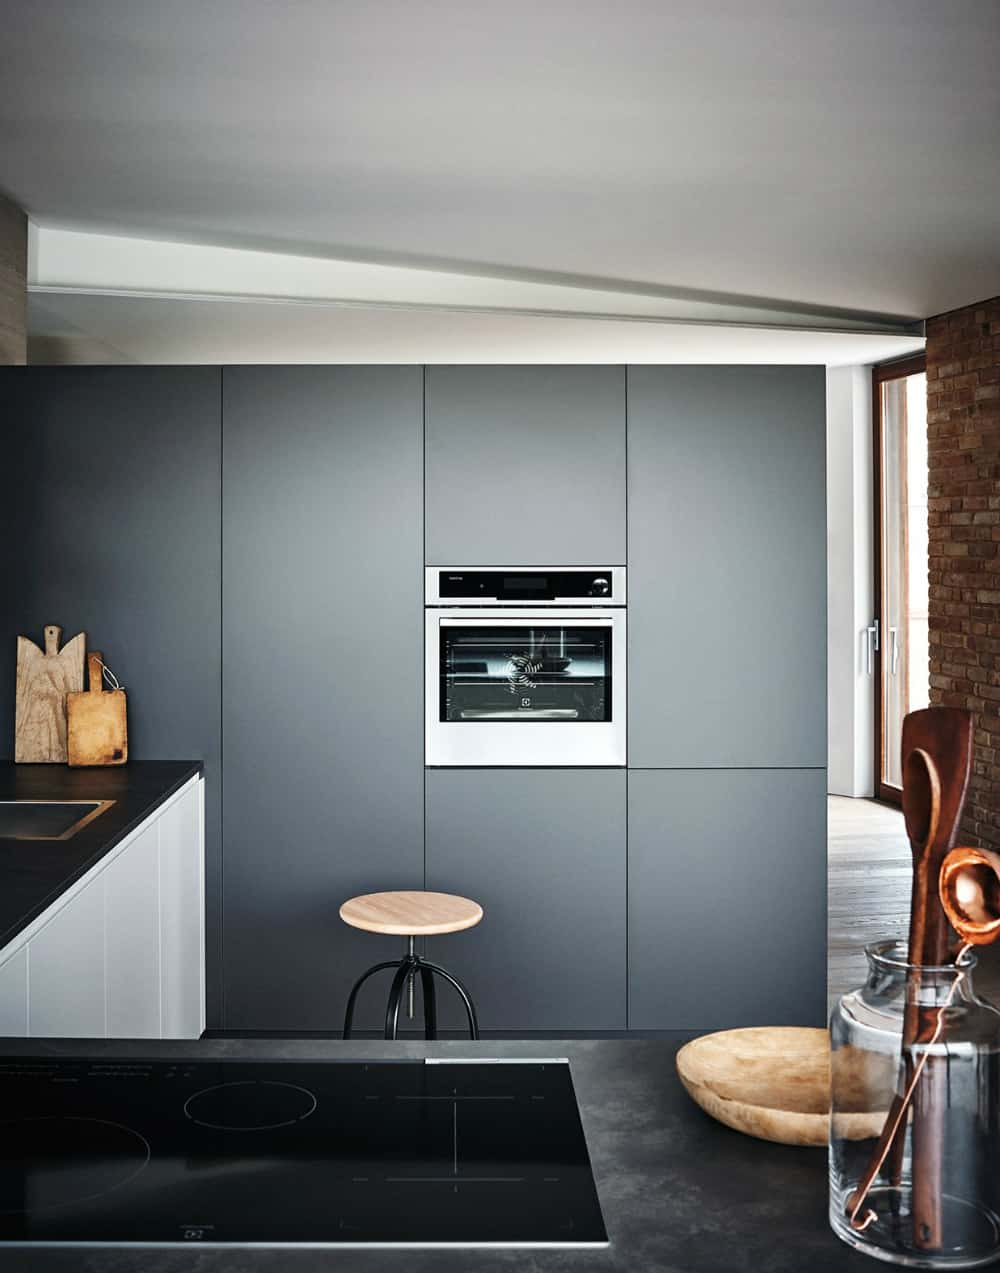 Minimalist cabinets